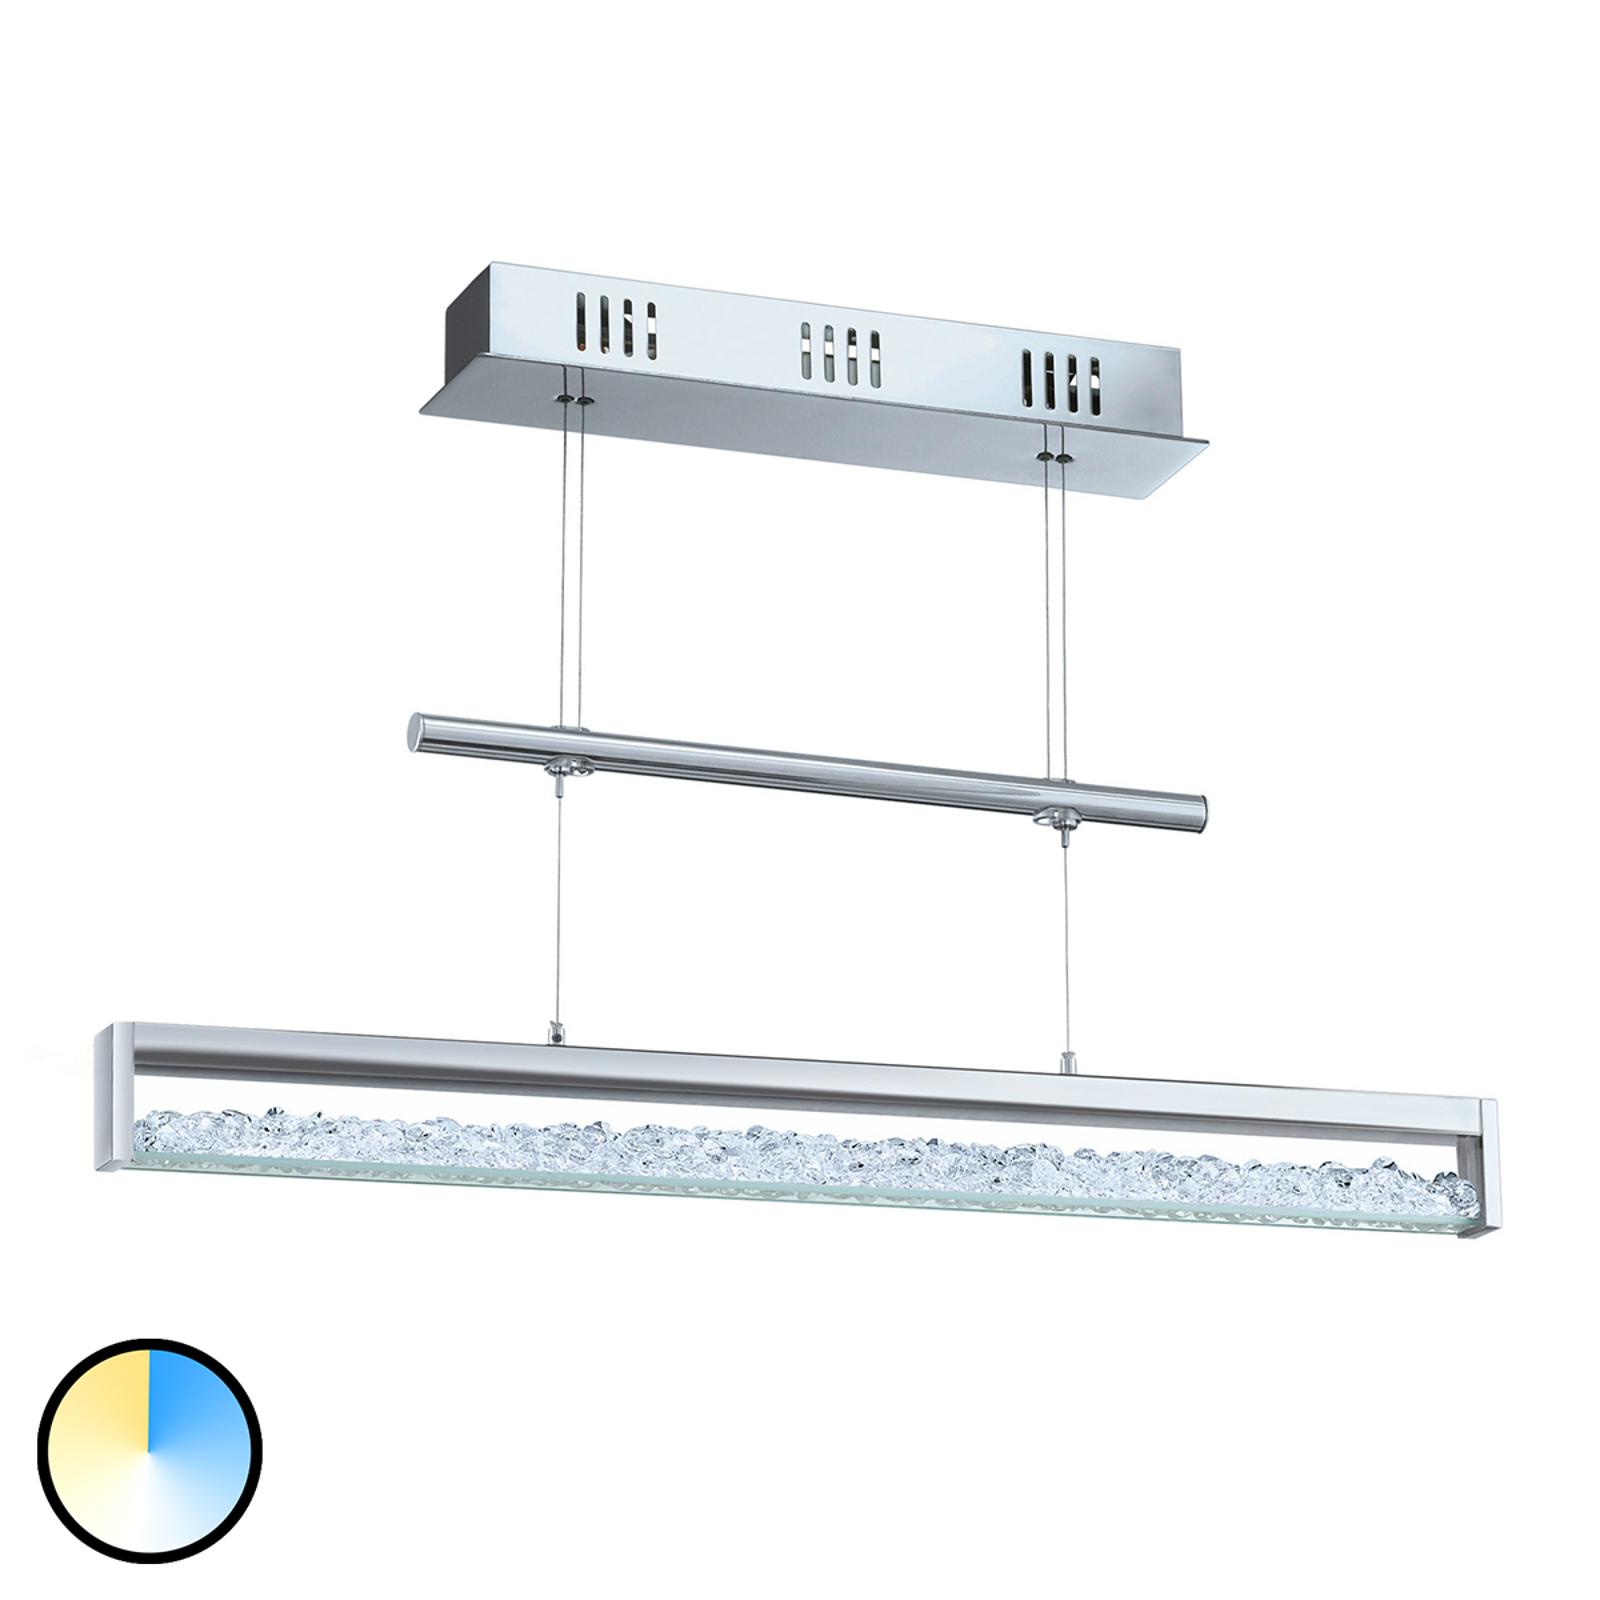 Dimmer integriert - LED-Hängeleuchte Cardito 1 70